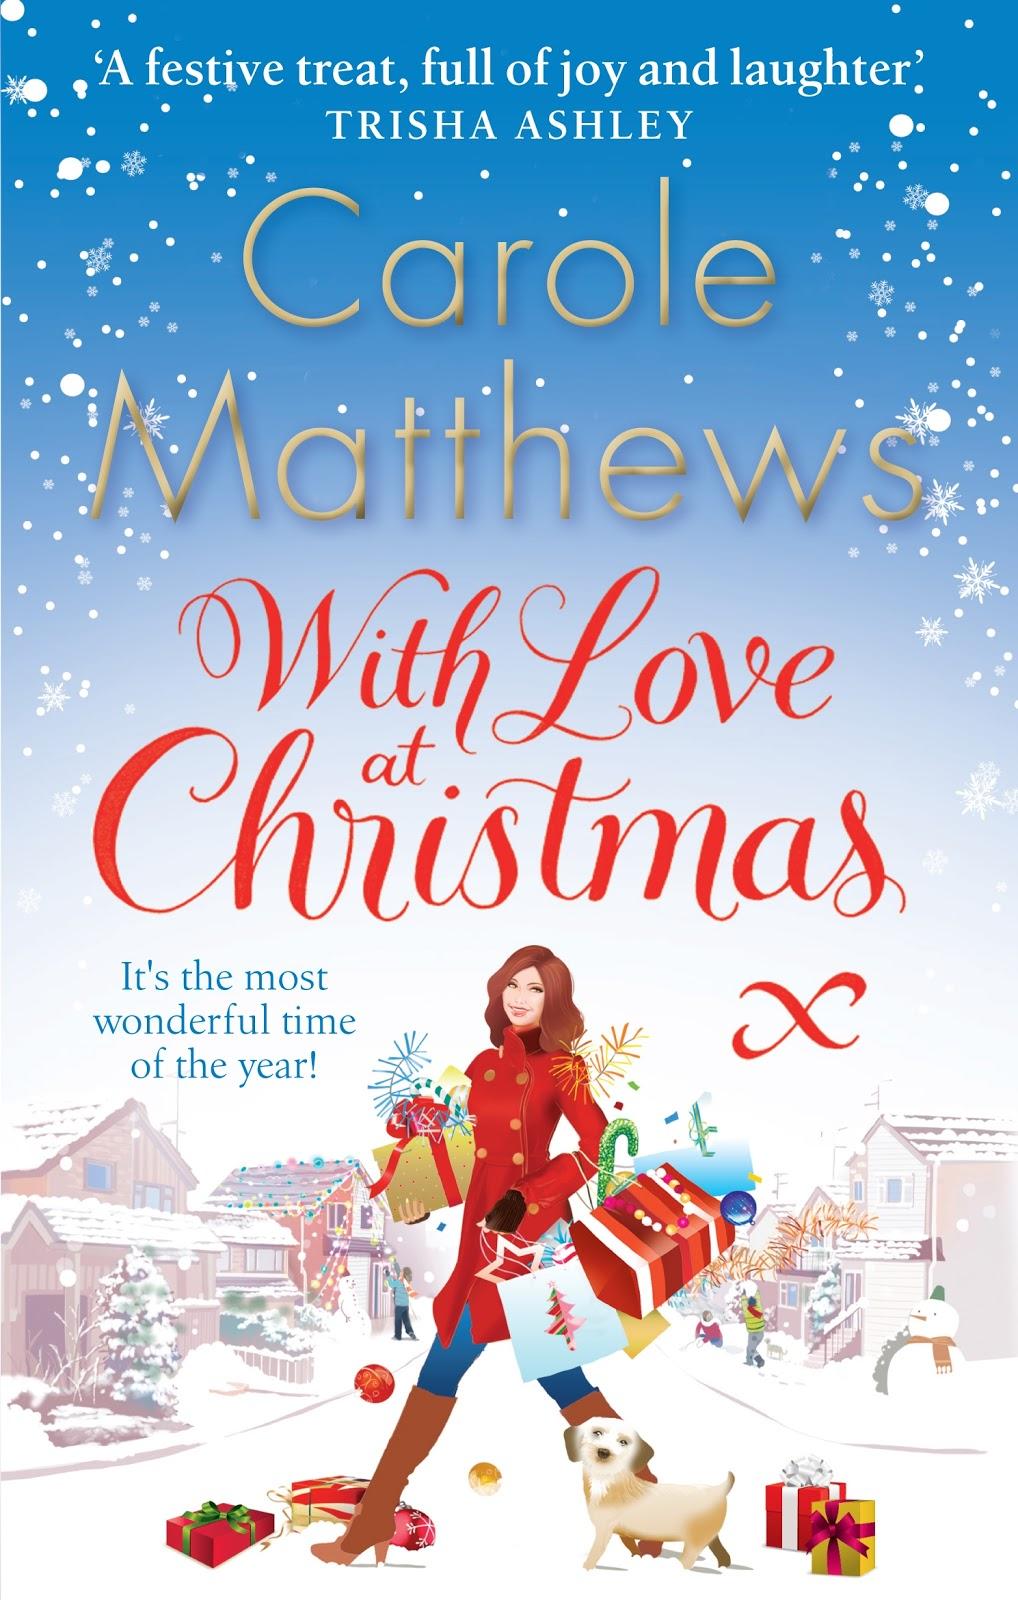 Carole Matthews Christmas Cakes And Mistole Nights